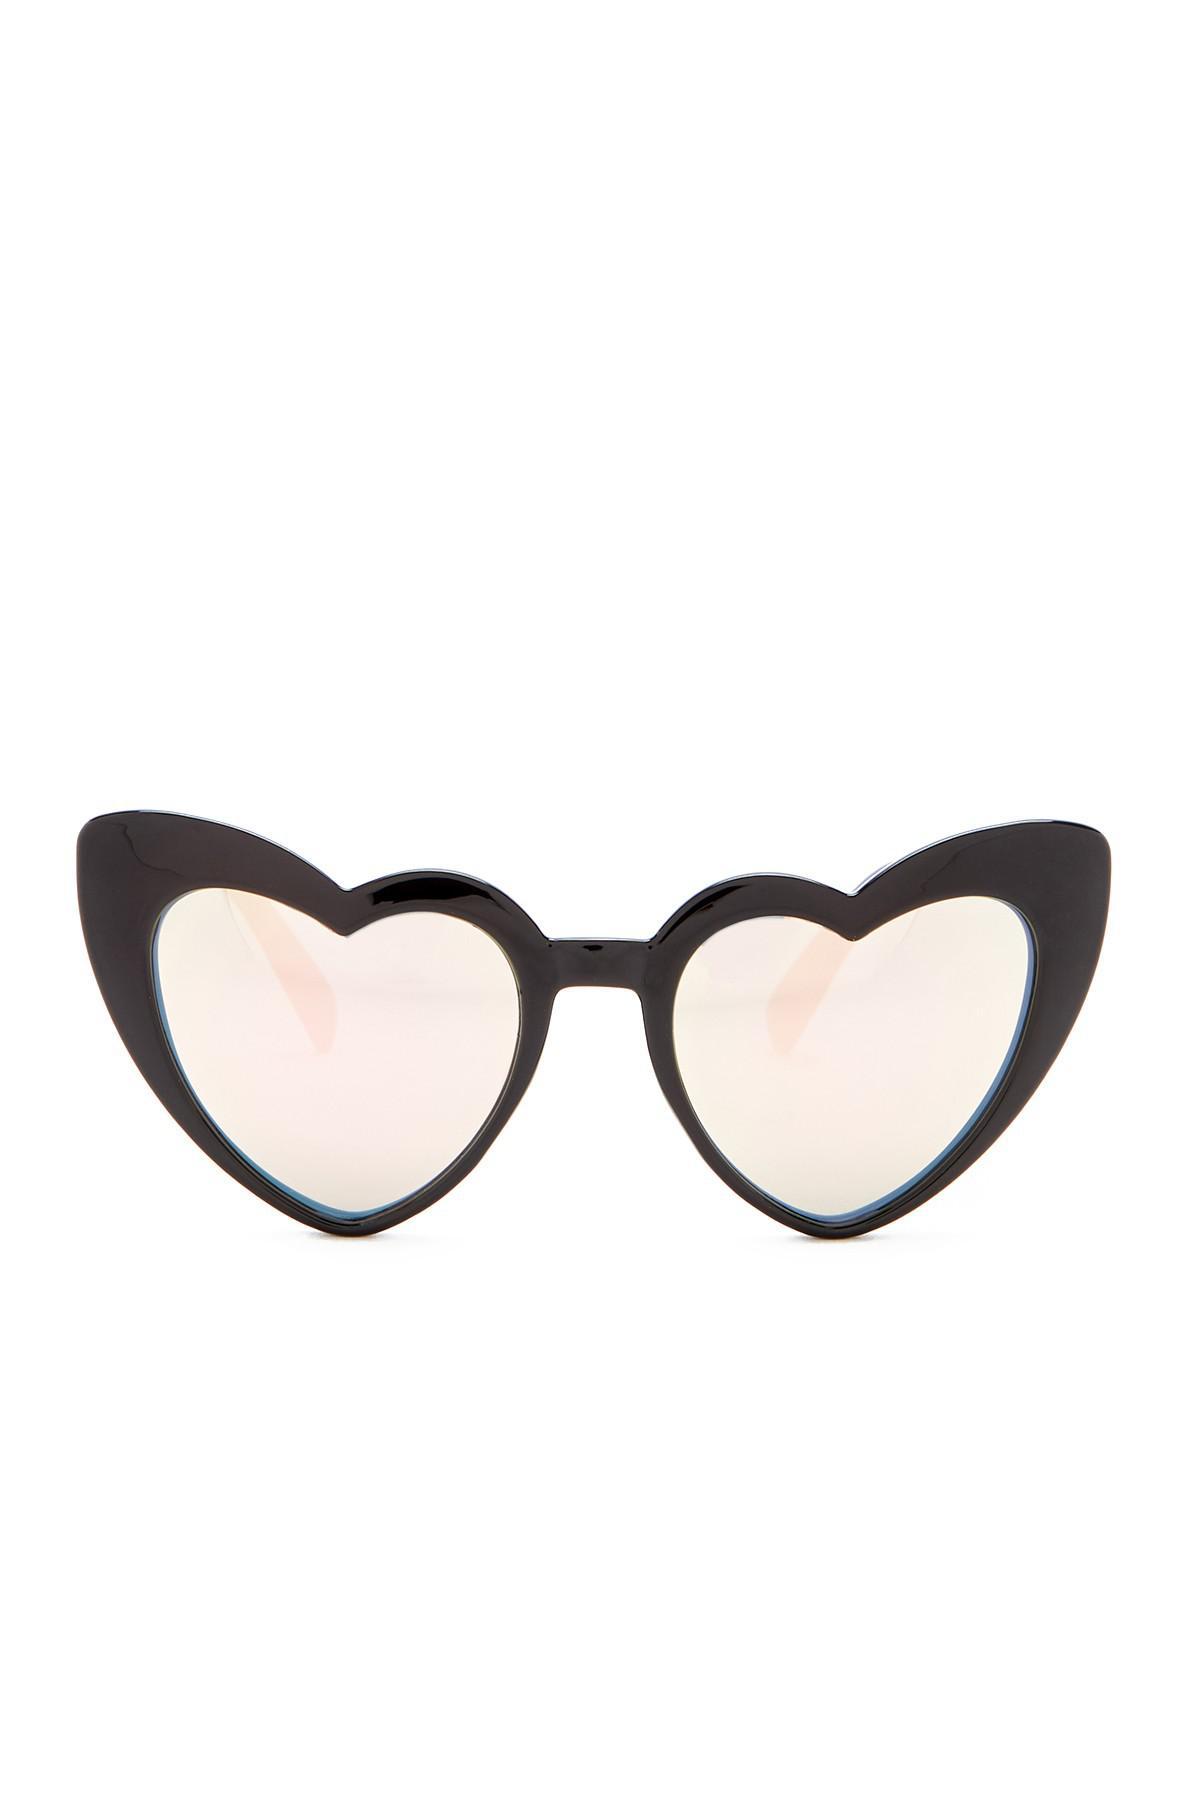 9c1ac84031255 Betsey Johnson 52mm Heart Cat Eye Sunglasses in Black - Lyst